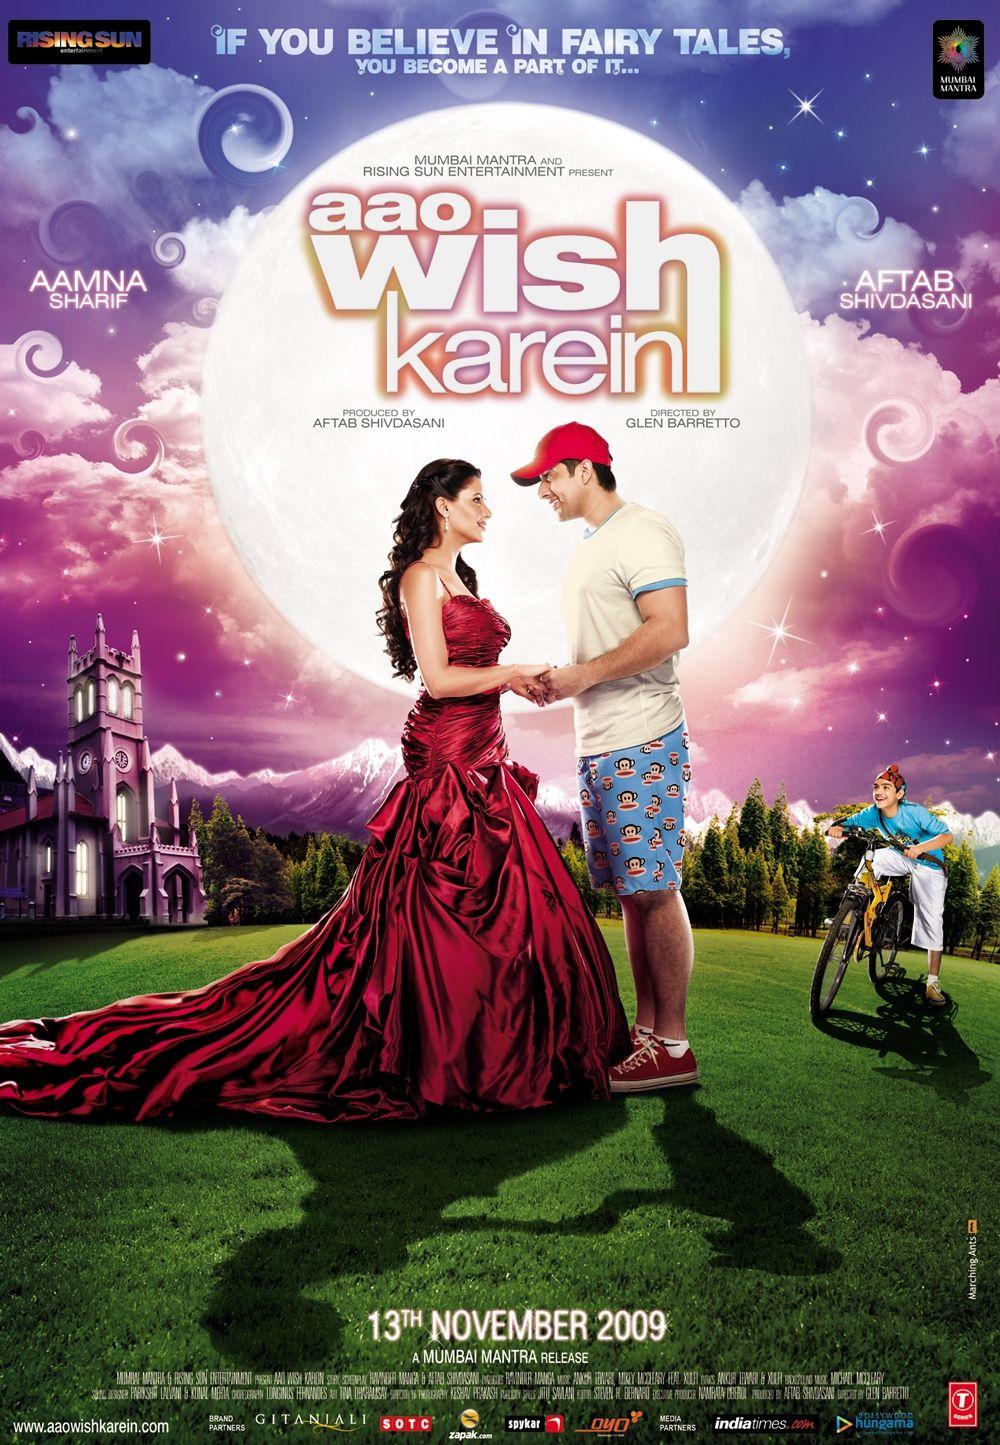 Загадай желание - (Aao Wish Karein)